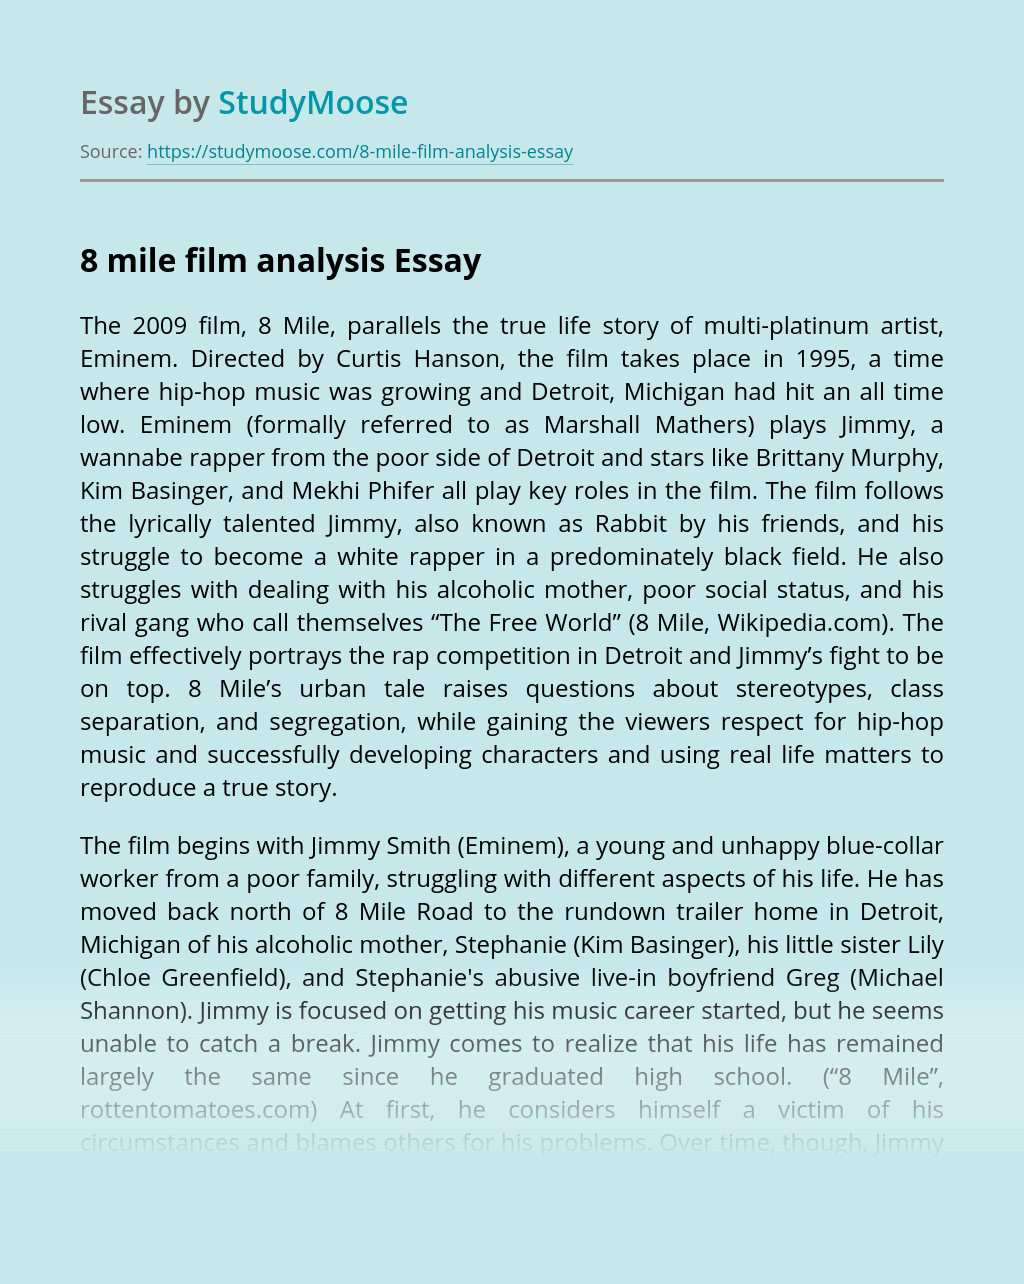 8 mile film analysis